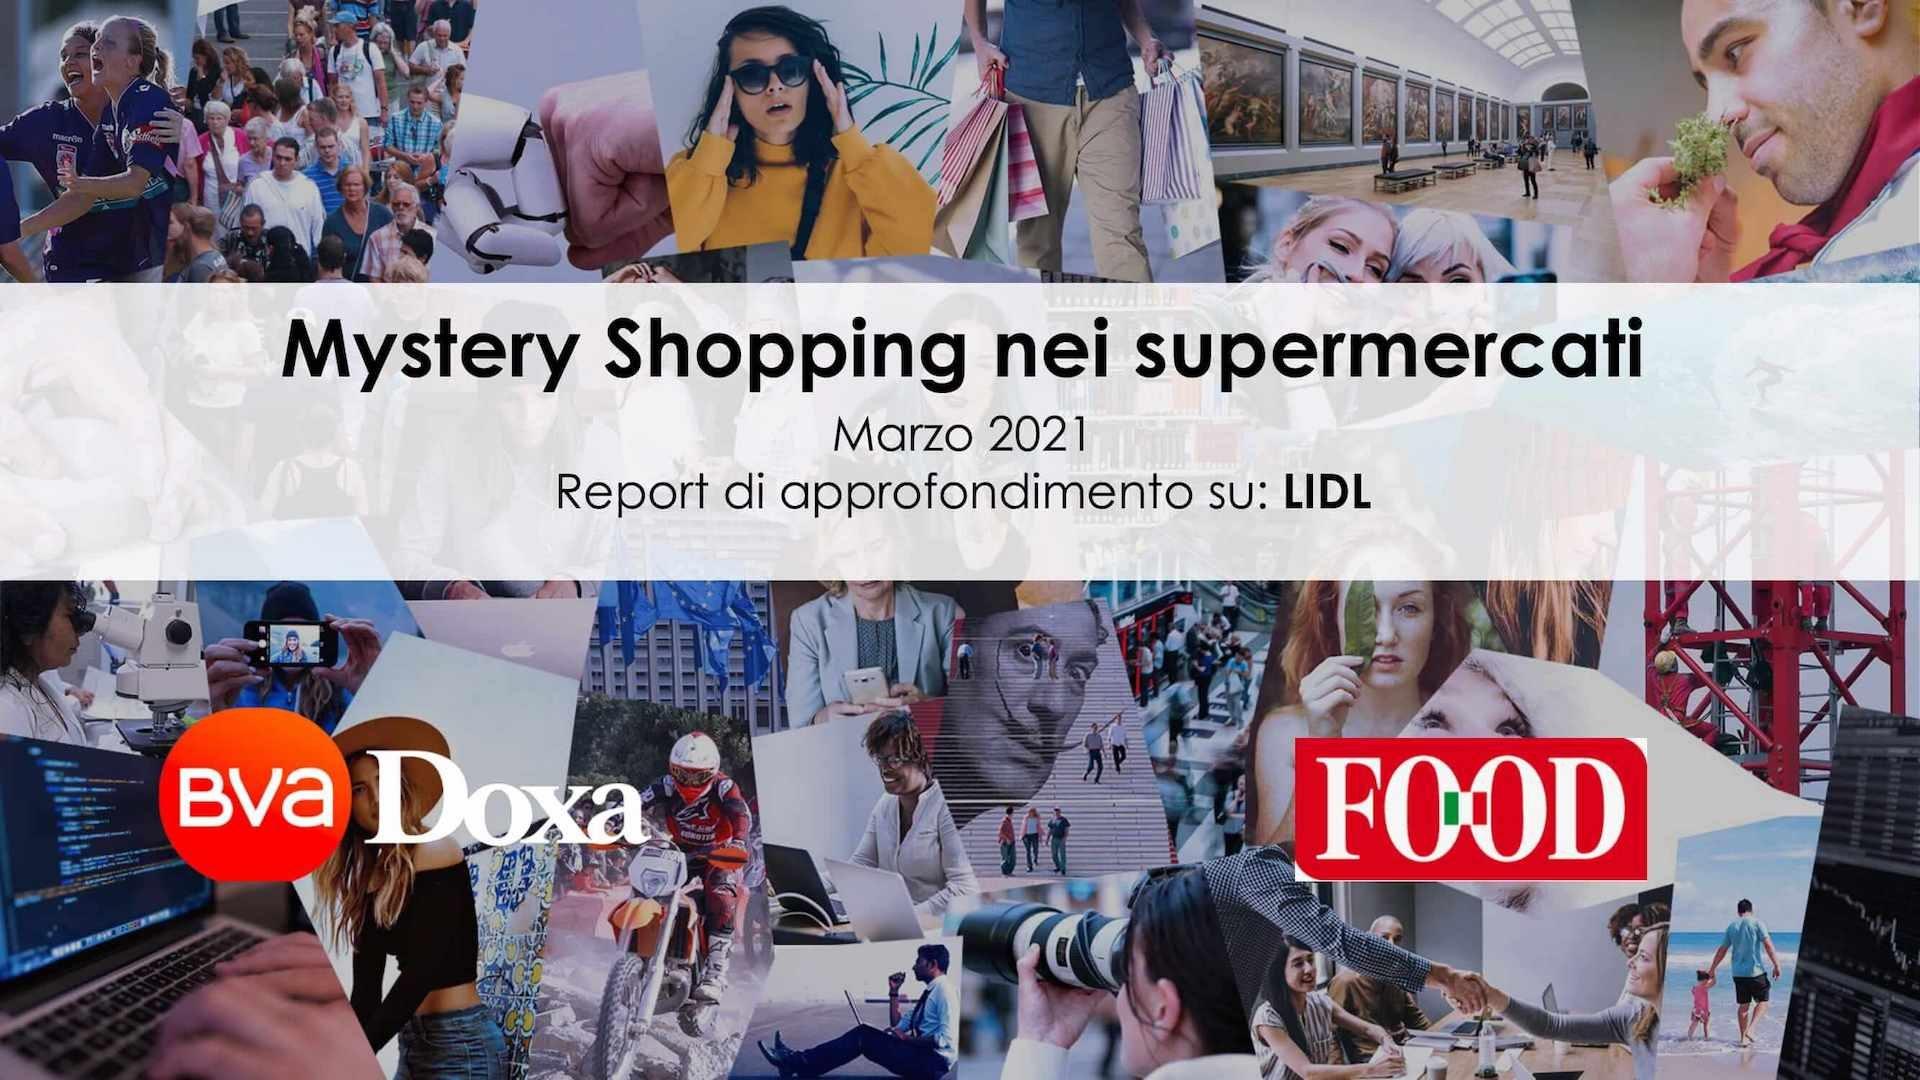 Bva Doxa Report Mystery Food Lidl 2021.03.17 01